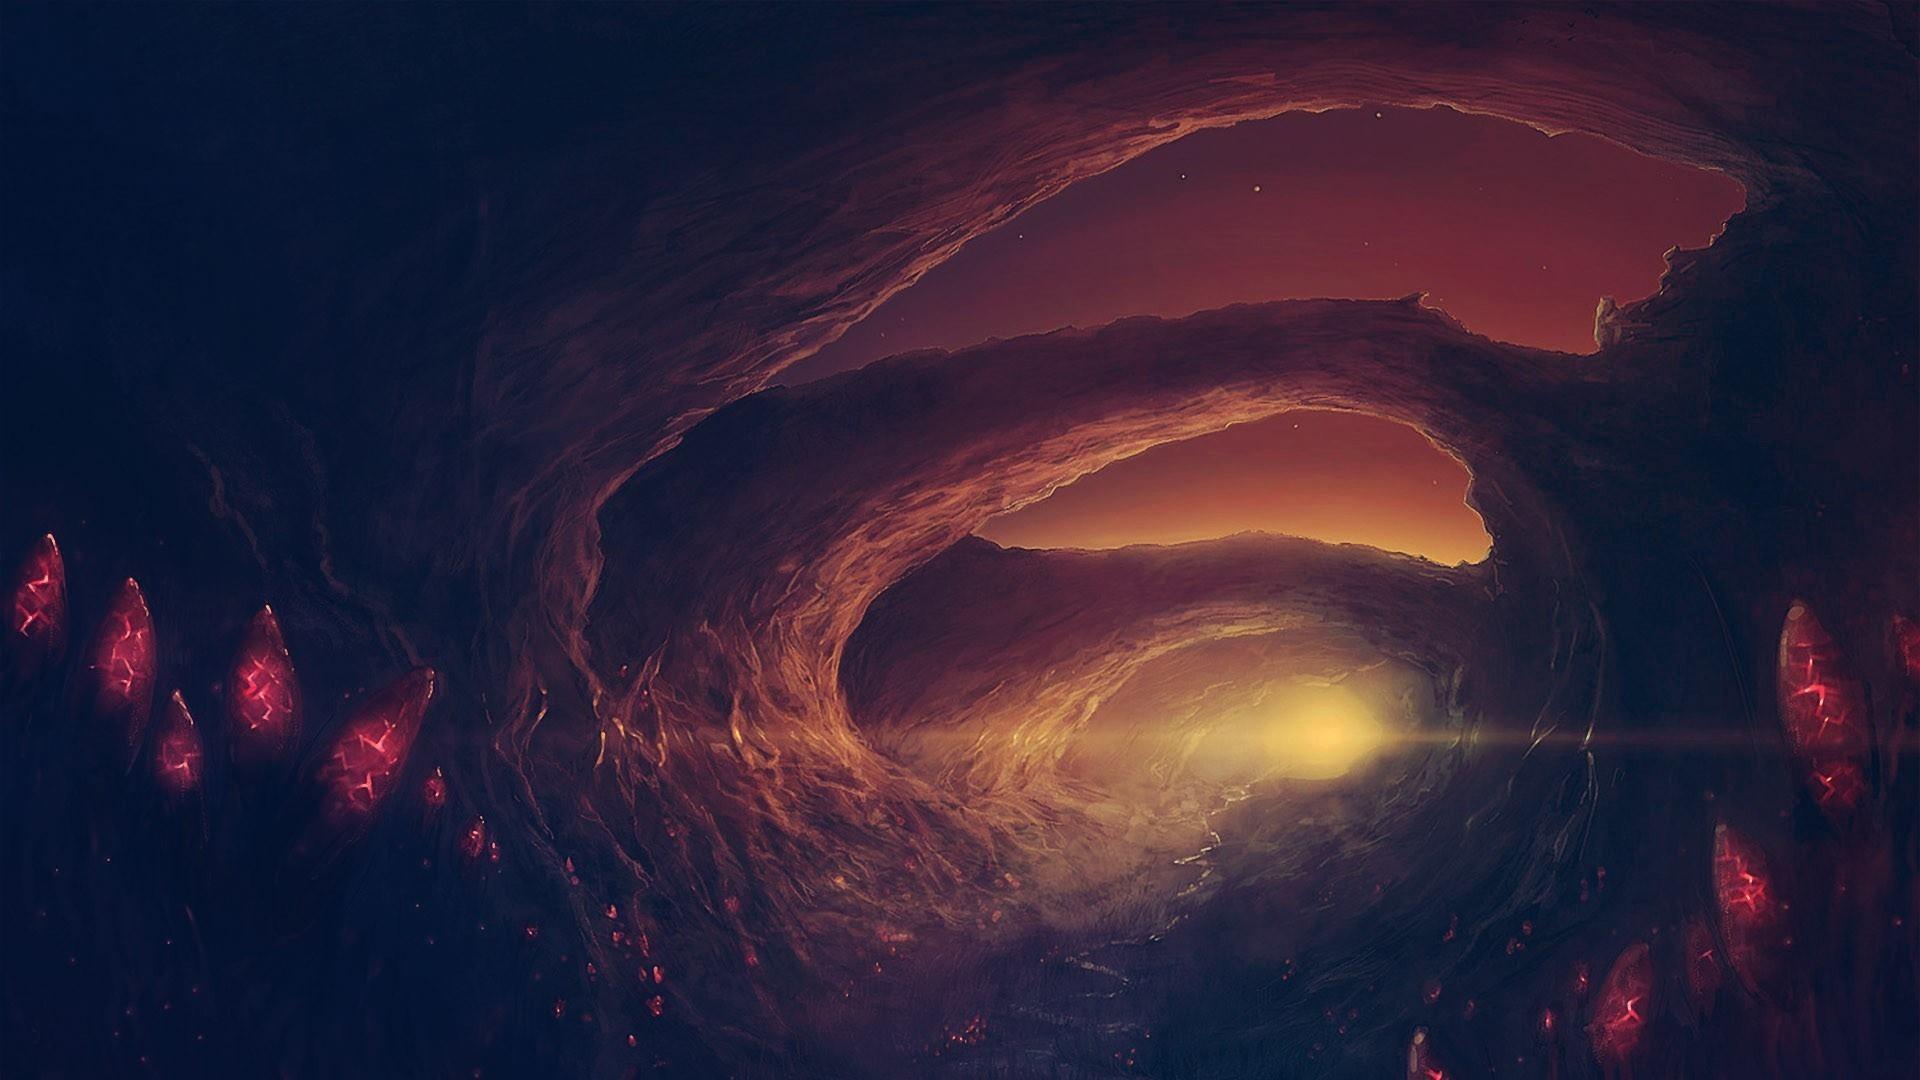 Sunset-HDR – Sunsets & Nature Background Wallpapers on Desktop Nexus .